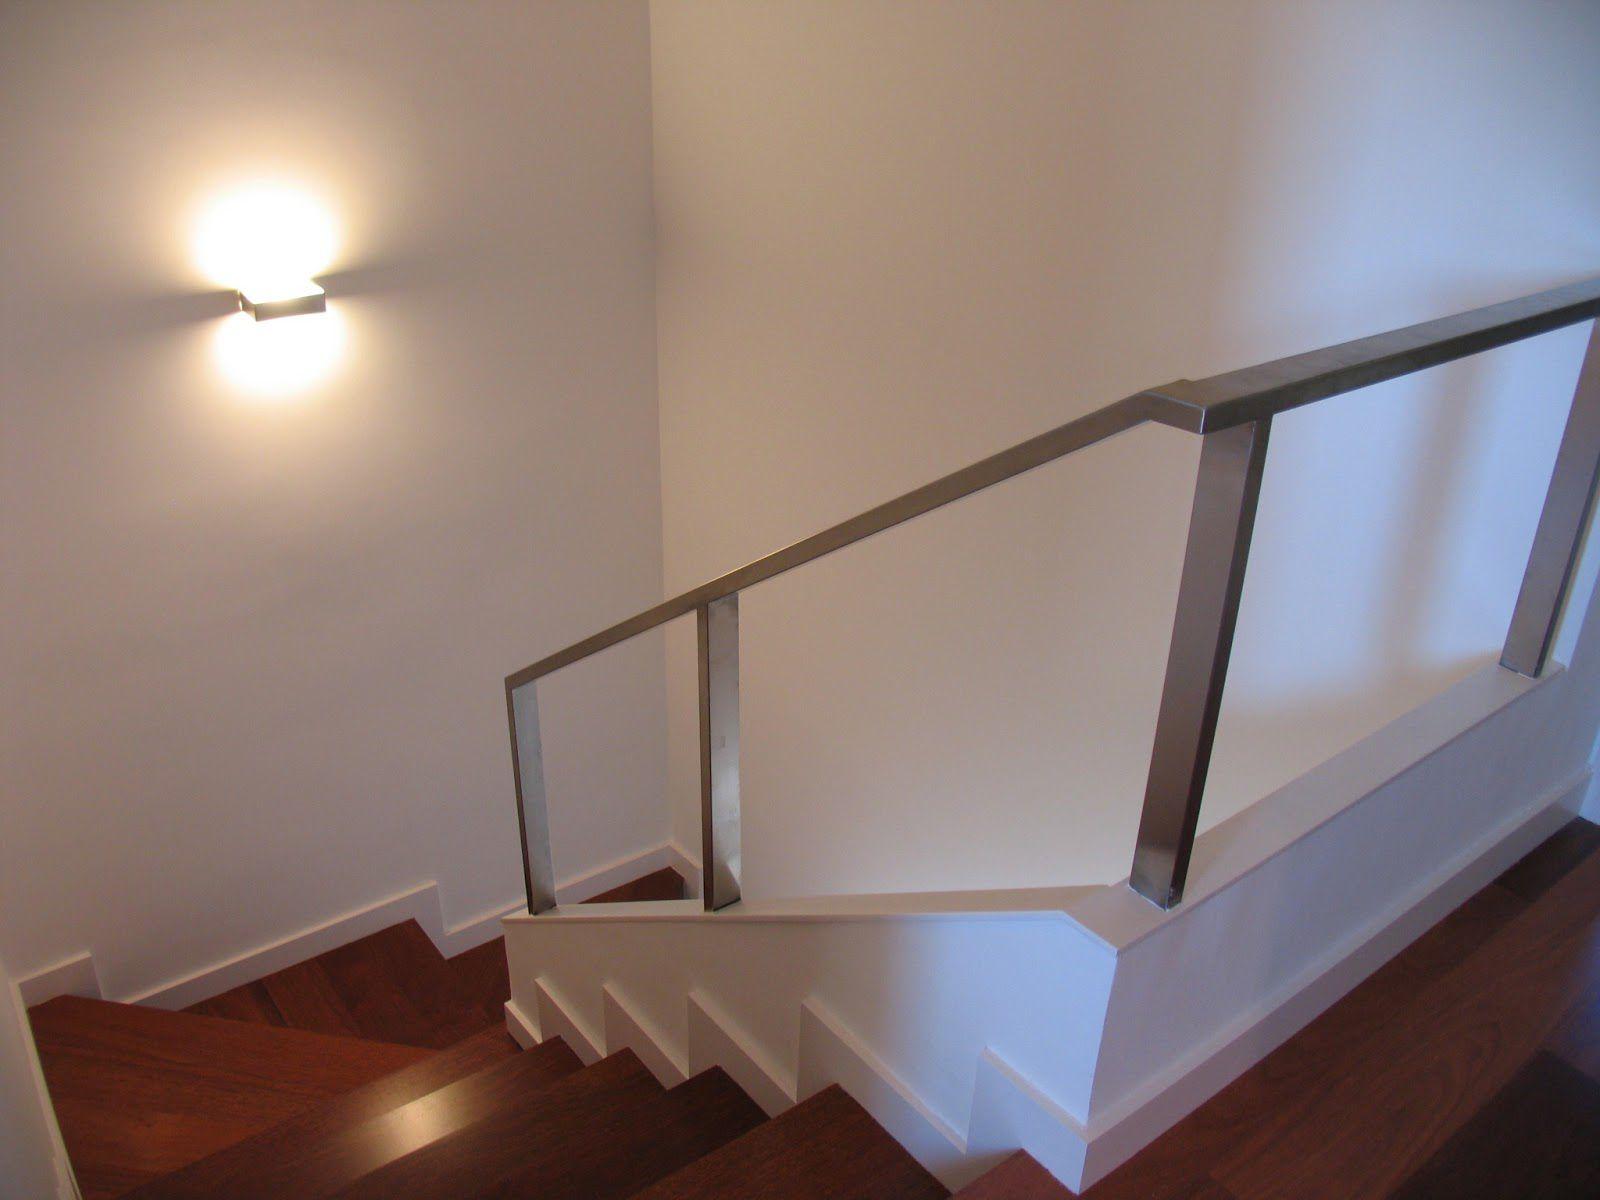 Apolo de pujol iluminaci n el blog de for Apliques de led para escaleras